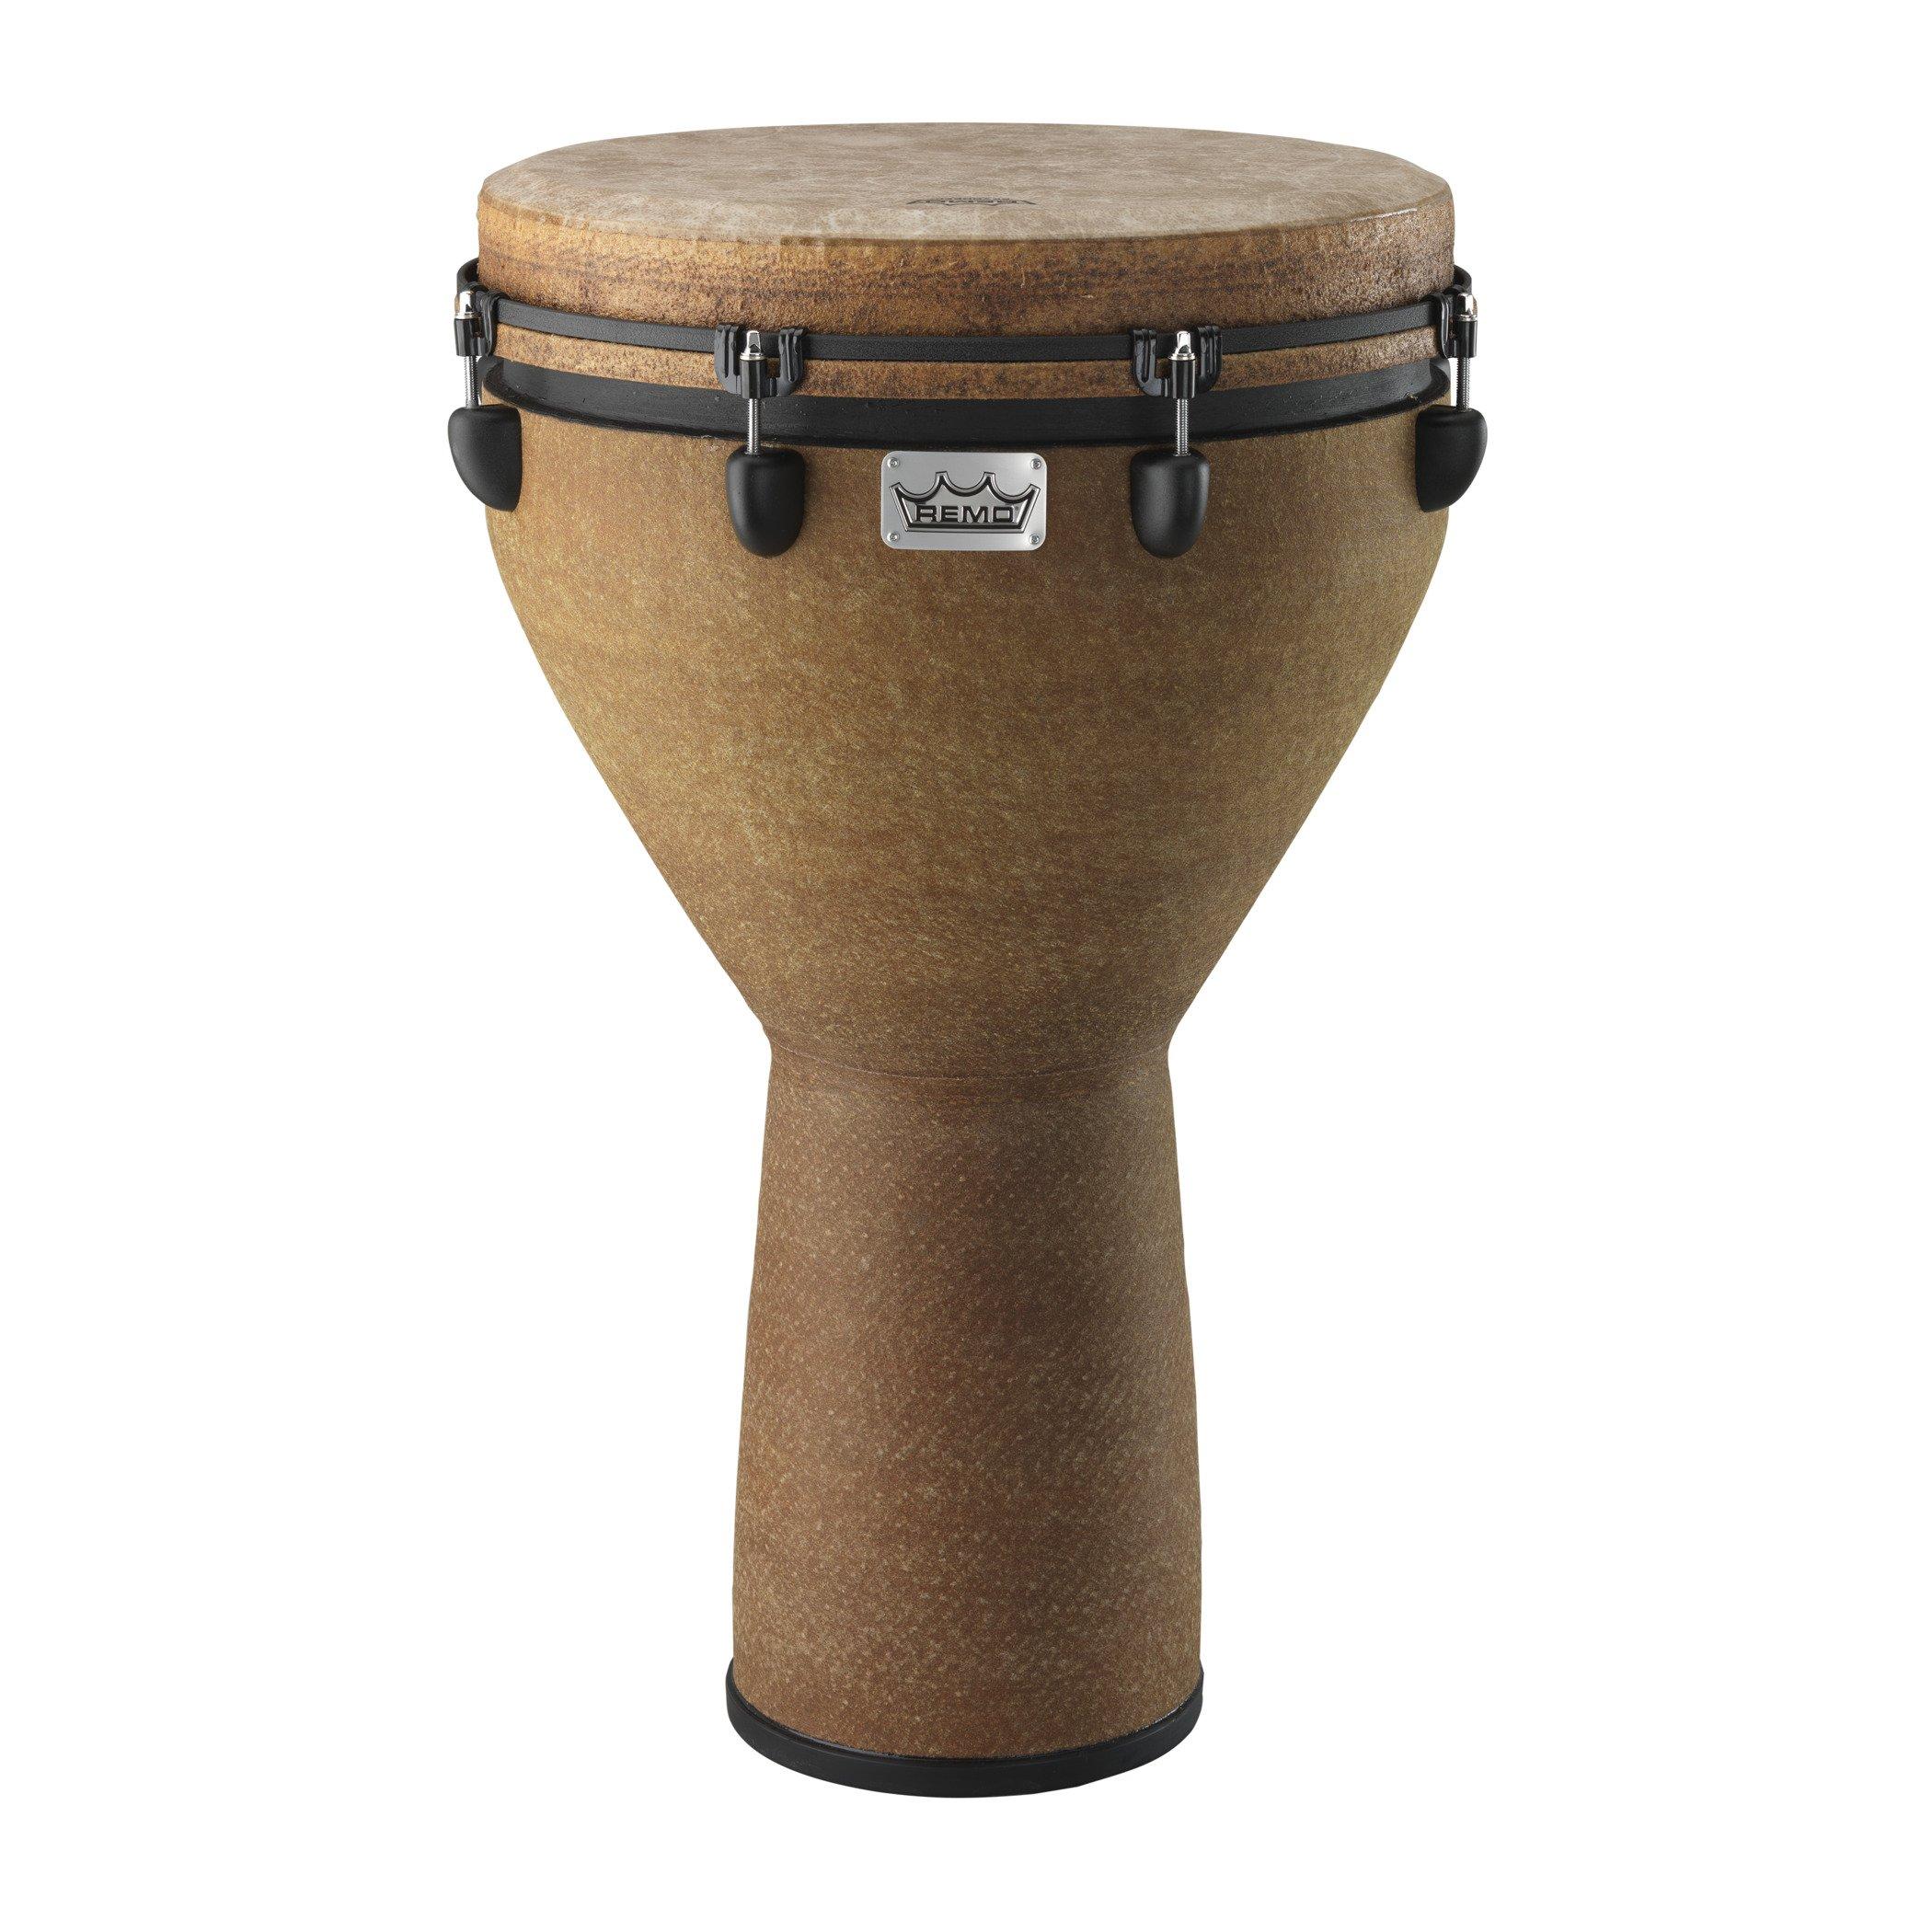 Remo DJ-0016-05 Mondo Djembe Drum - Earth, 16''